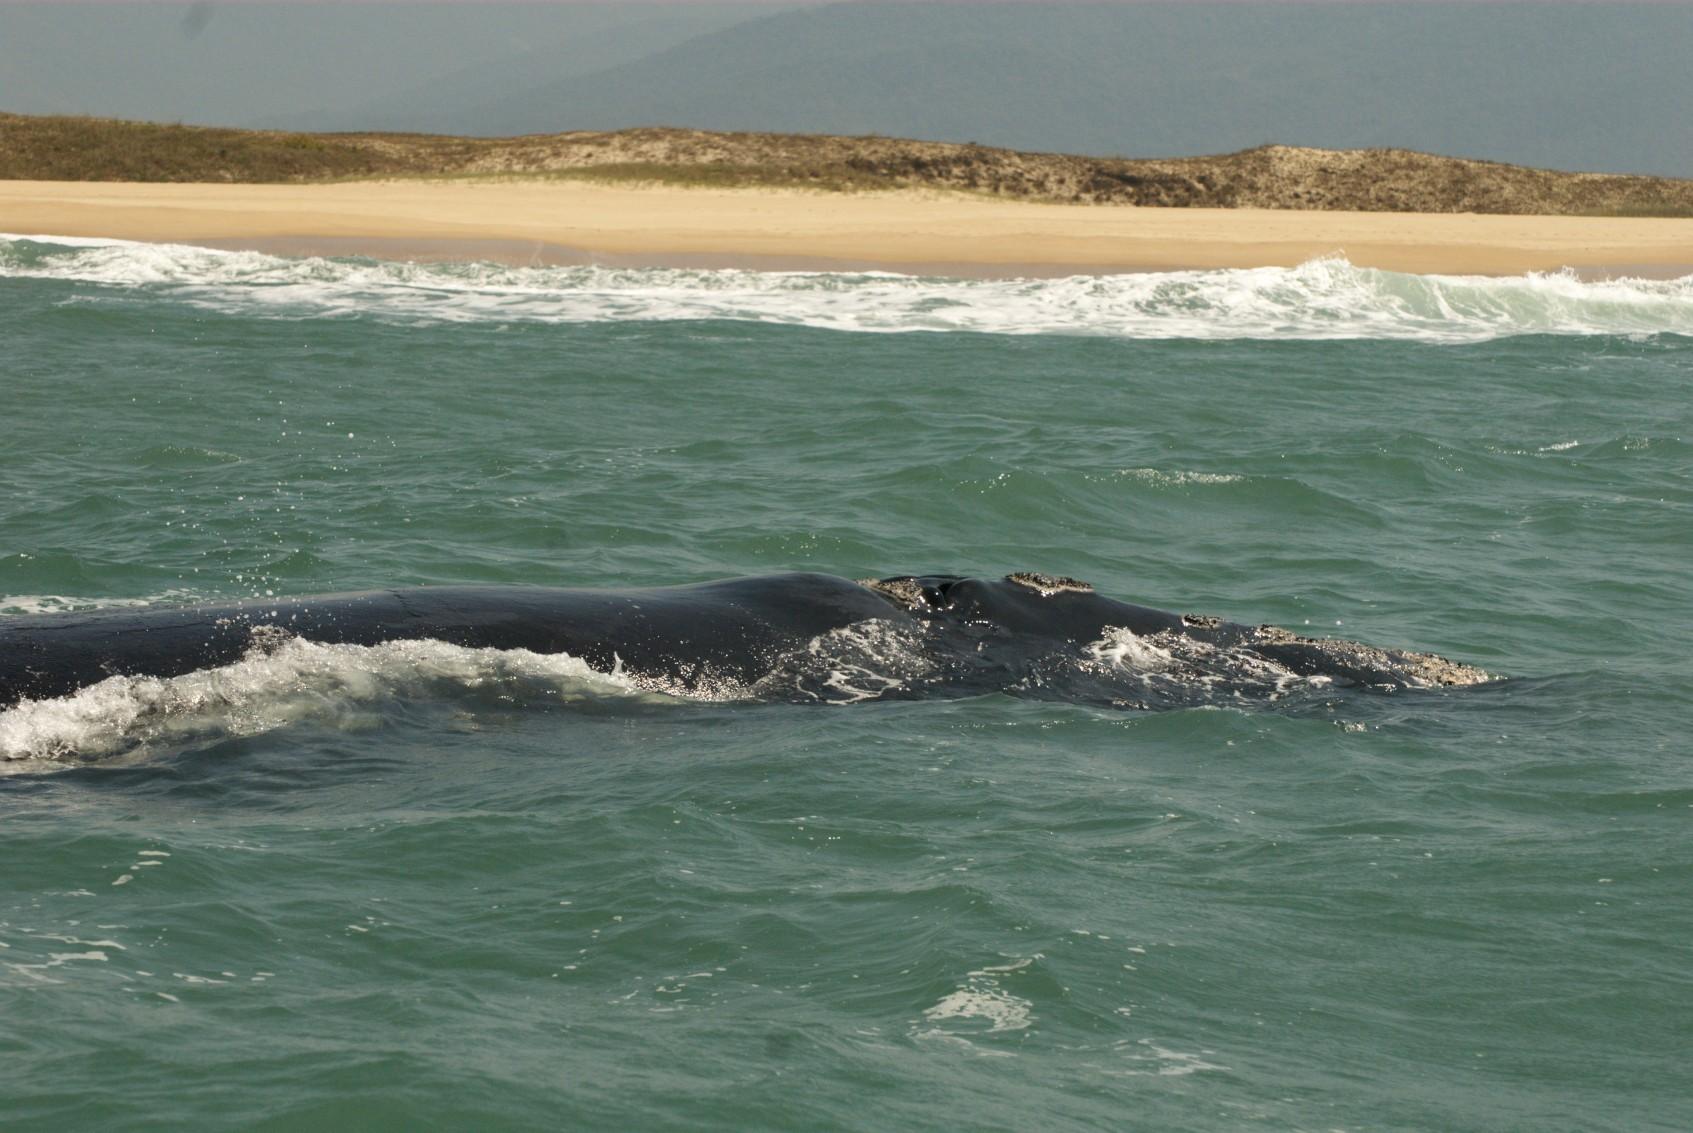 bra07-whalewatch-free-santur